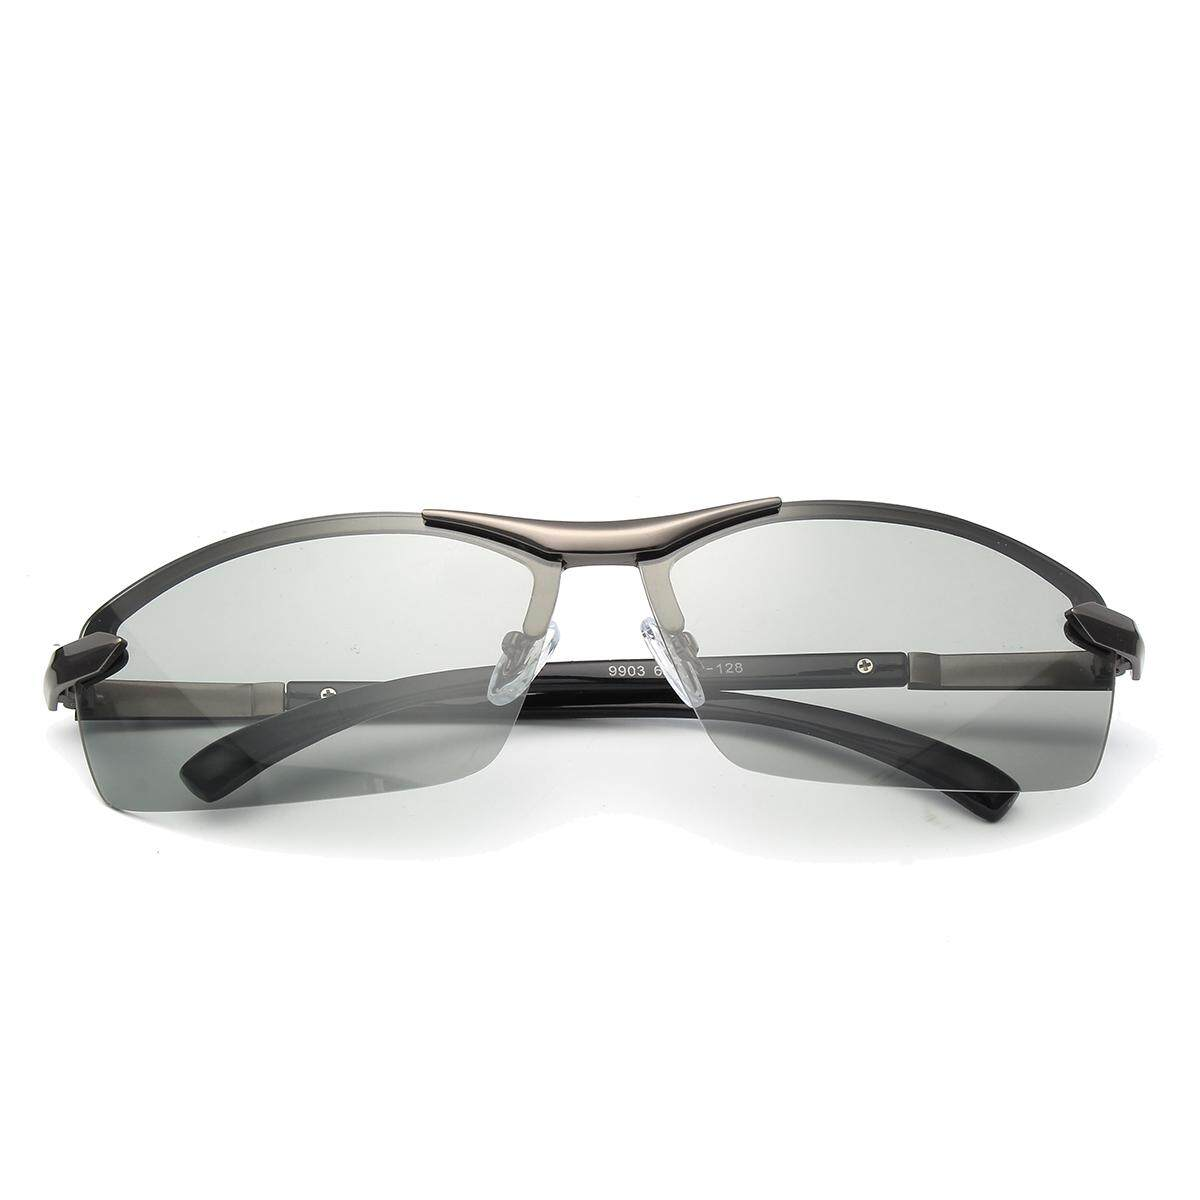 Terpolarisasi Photochromic Sunglass Pria Kolam Mengemudi Transisi Lensa Kacamata Hitam Abu-abu-Internasional